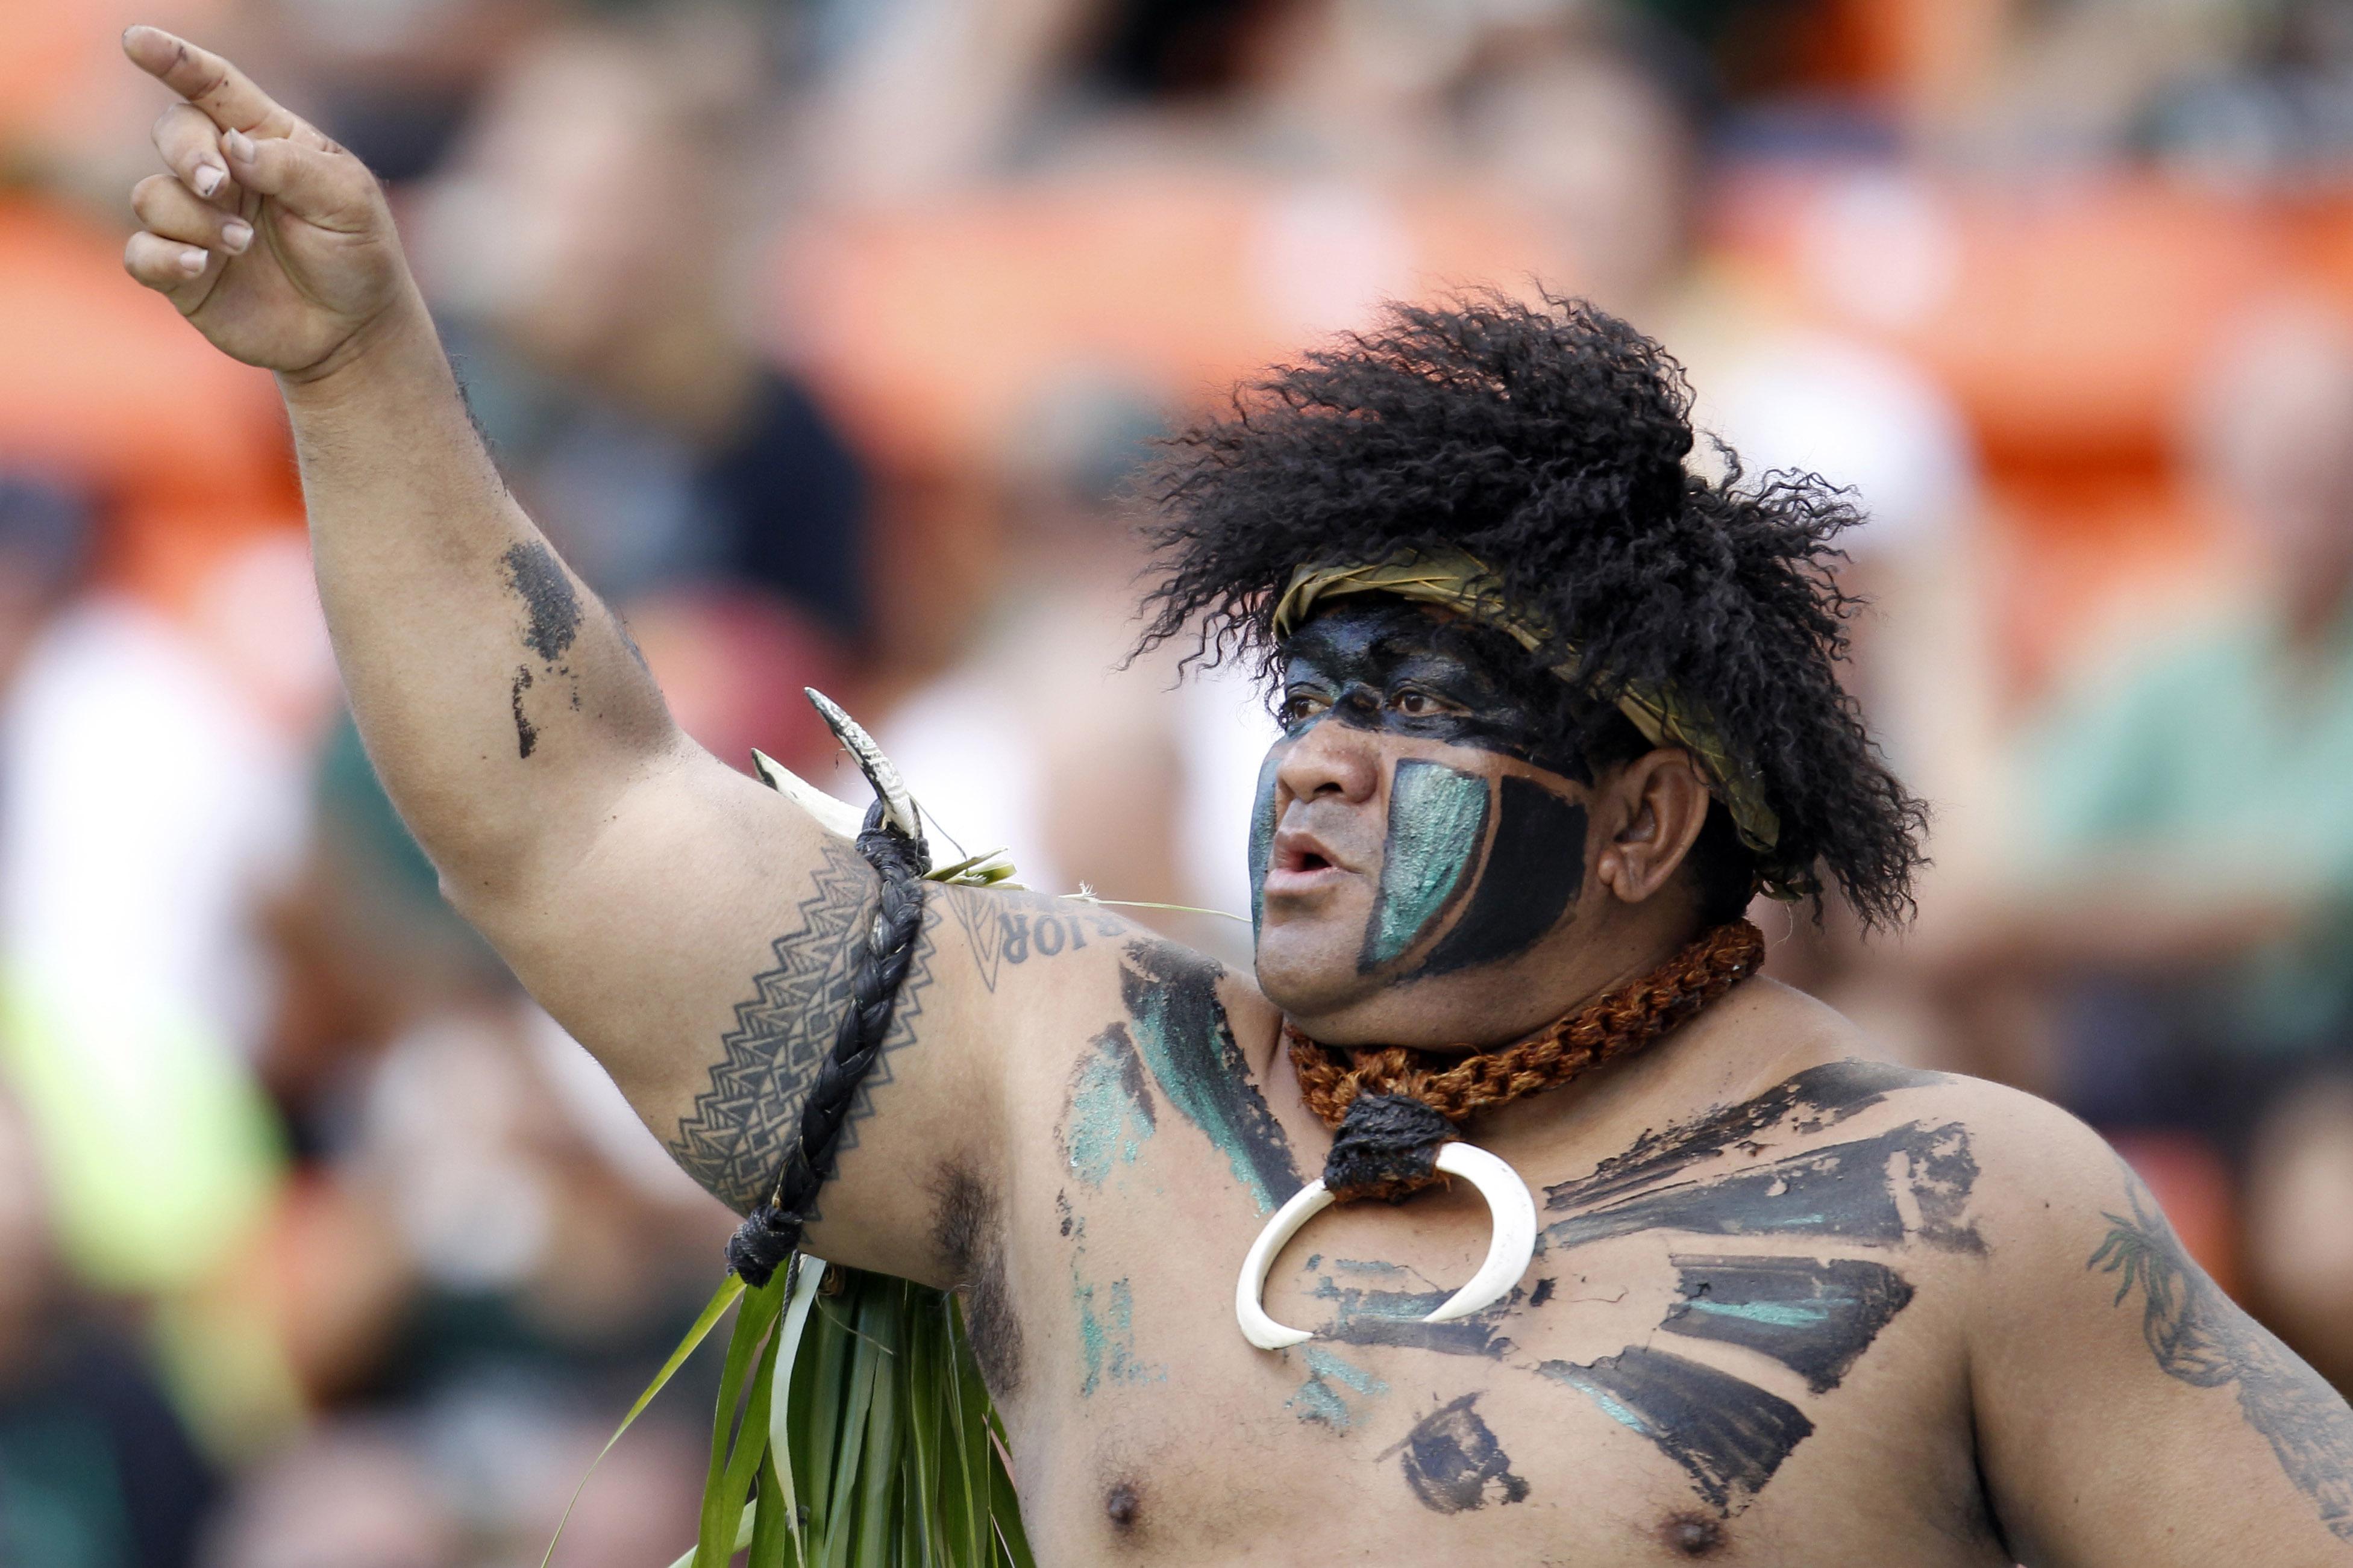 HONOLULU - SEPTEMBER 02: Vili Fehoko, the University of Hawaii Mascot at Aloha Stadium September 2, 2010 in Honolulu, Hawaii. (Photo by Kent Nishimura/Getty Images)